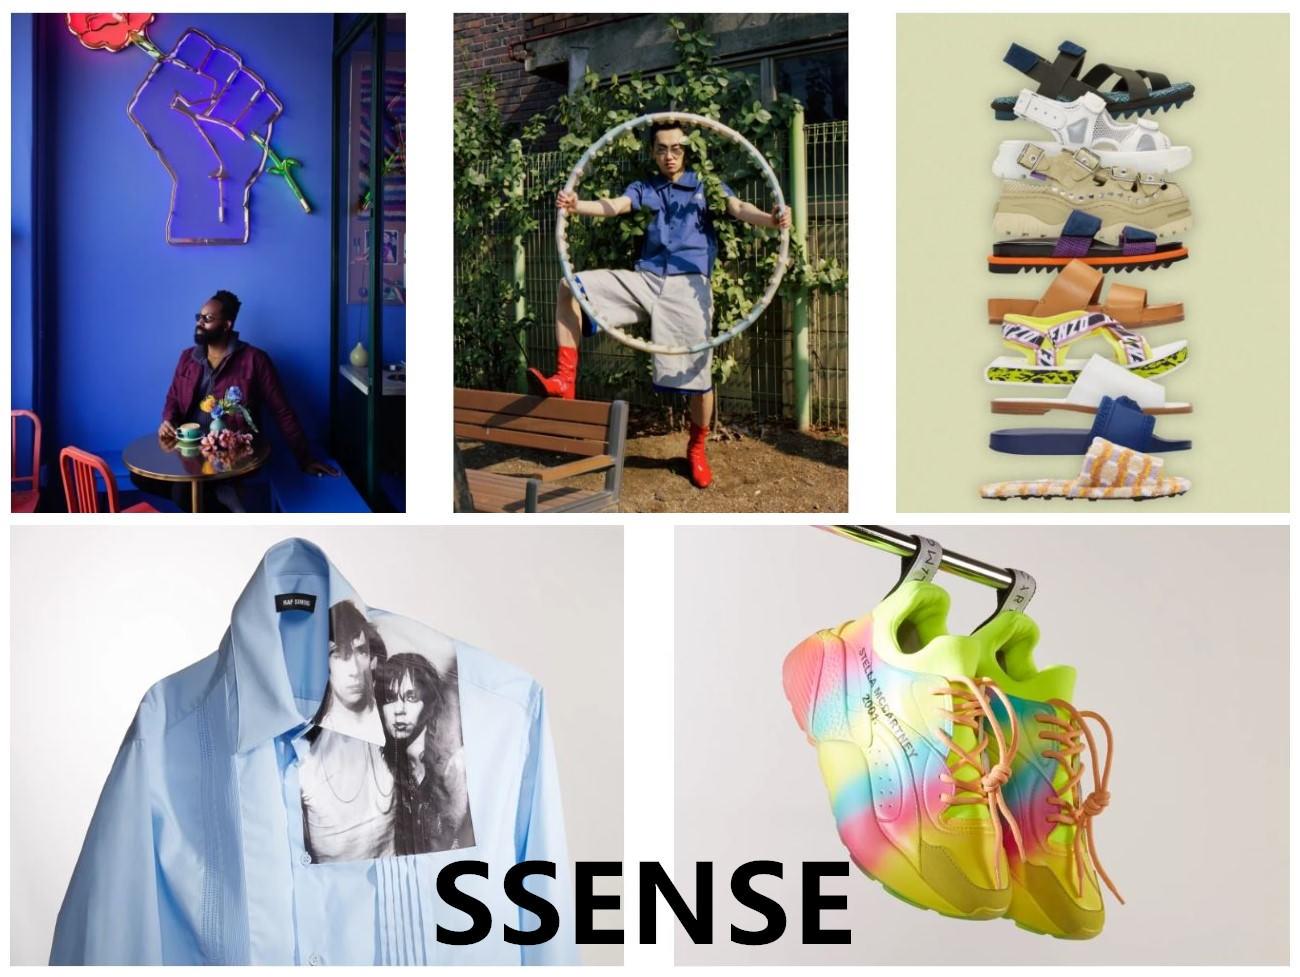 Ssense快遞關稅、Ssense折扣、Ssense折扣代碼、Ssense注意事項、Ssense結帳、Ssense加拿大休閒精品購物網、Ssense註冊會員、Ssense購物教學